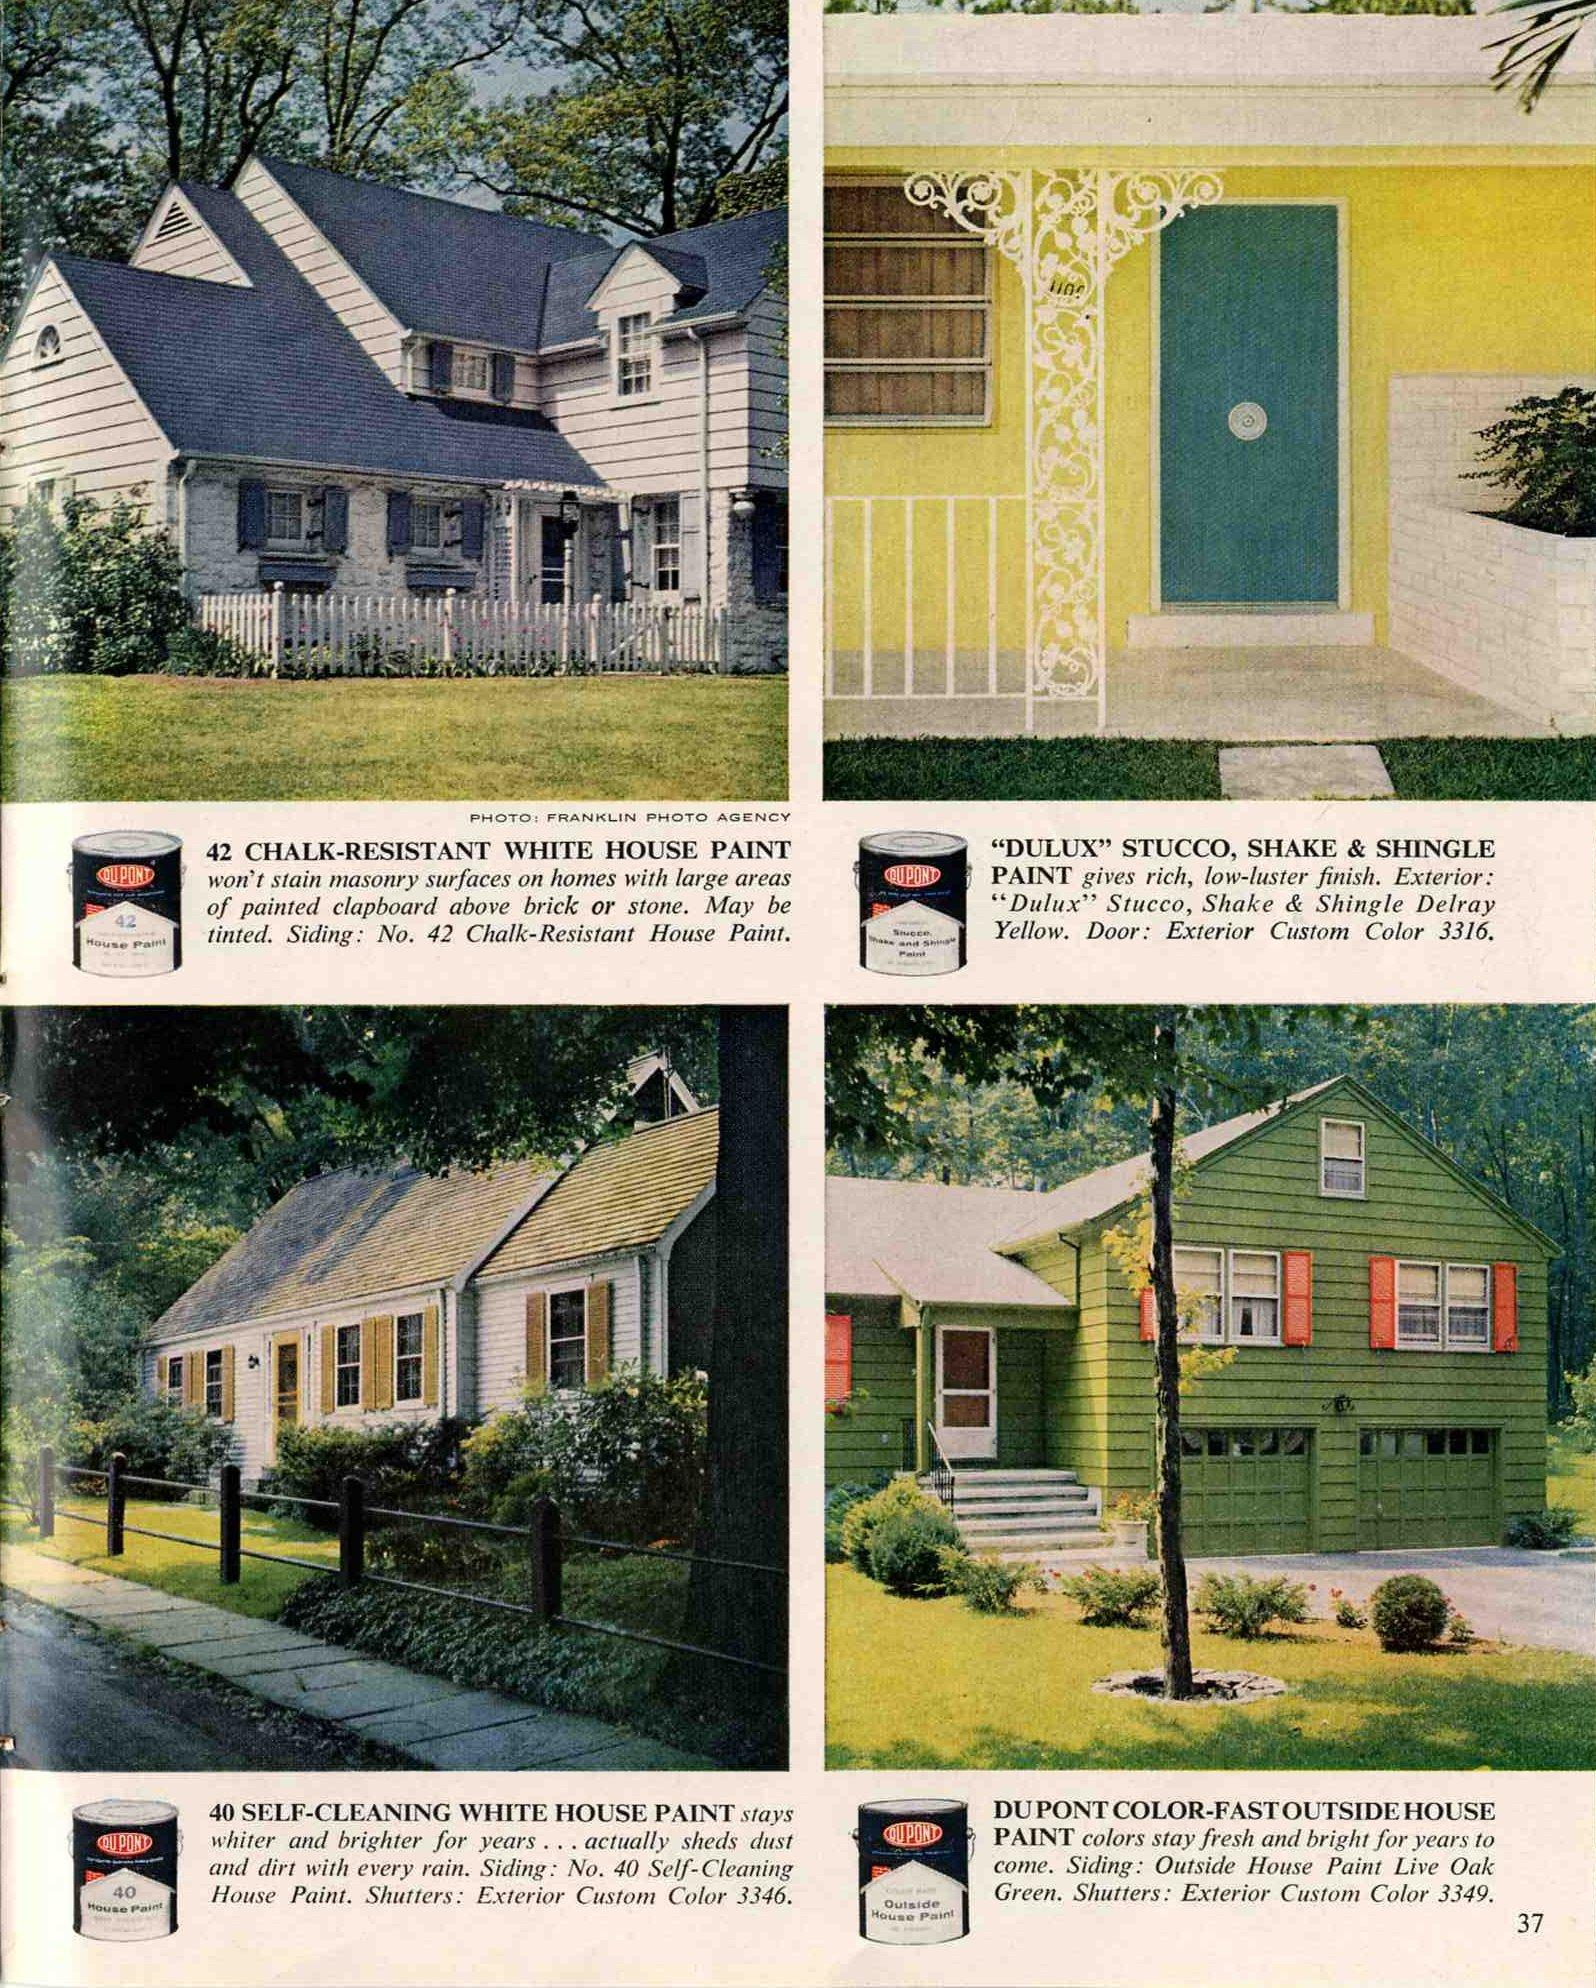 Remarkable Exterior Colors For 1960 Houses Retro Renovation Largest Home Design Picture Inspirations Pitcheantrous